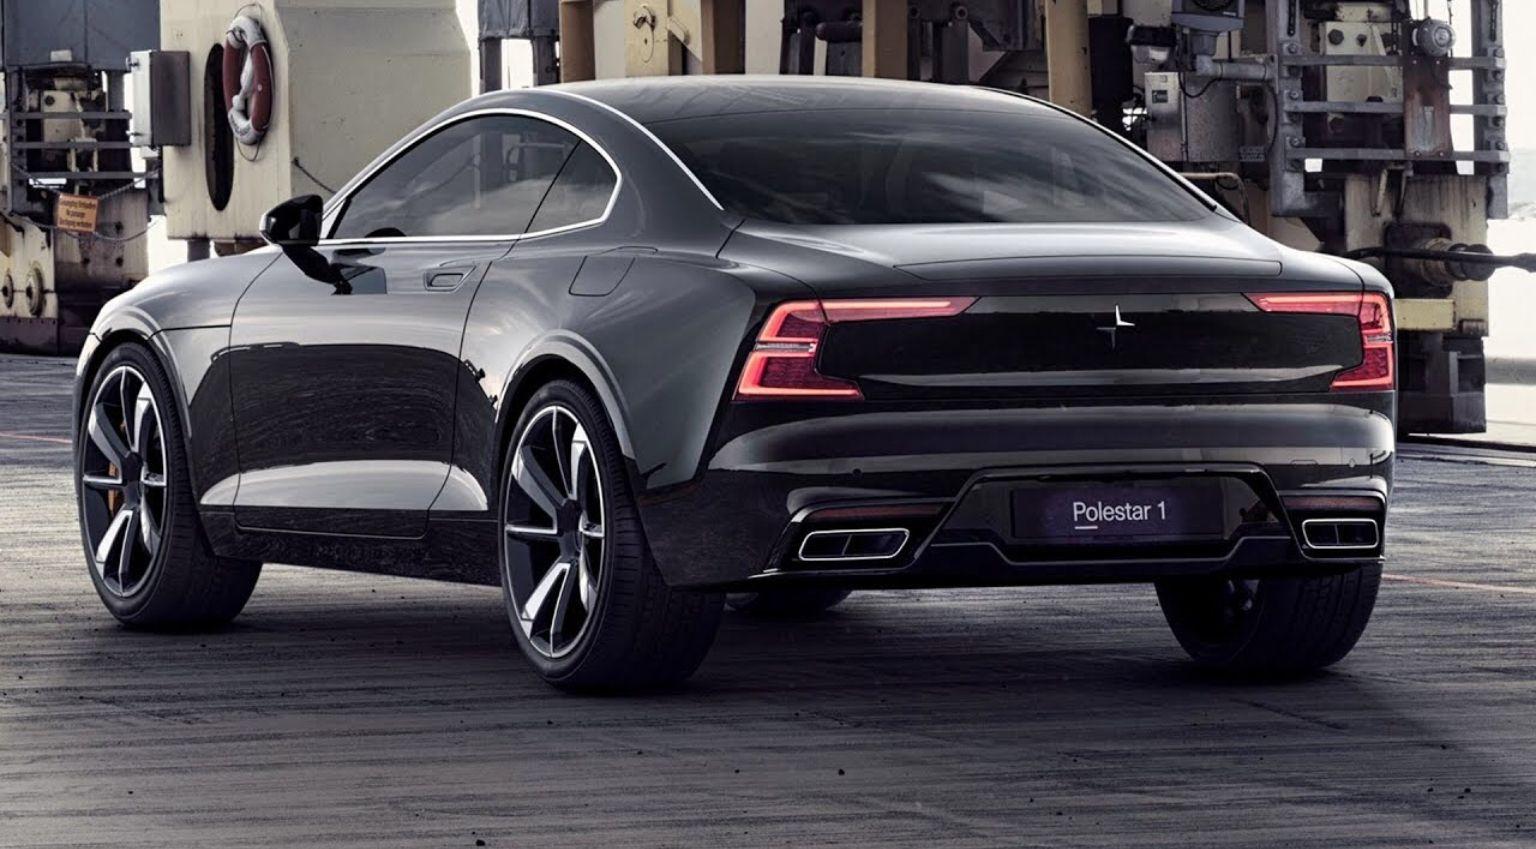 2019 Volvo Polestar 1 Hybrid 600hp 1000nm Awd 8 Speed